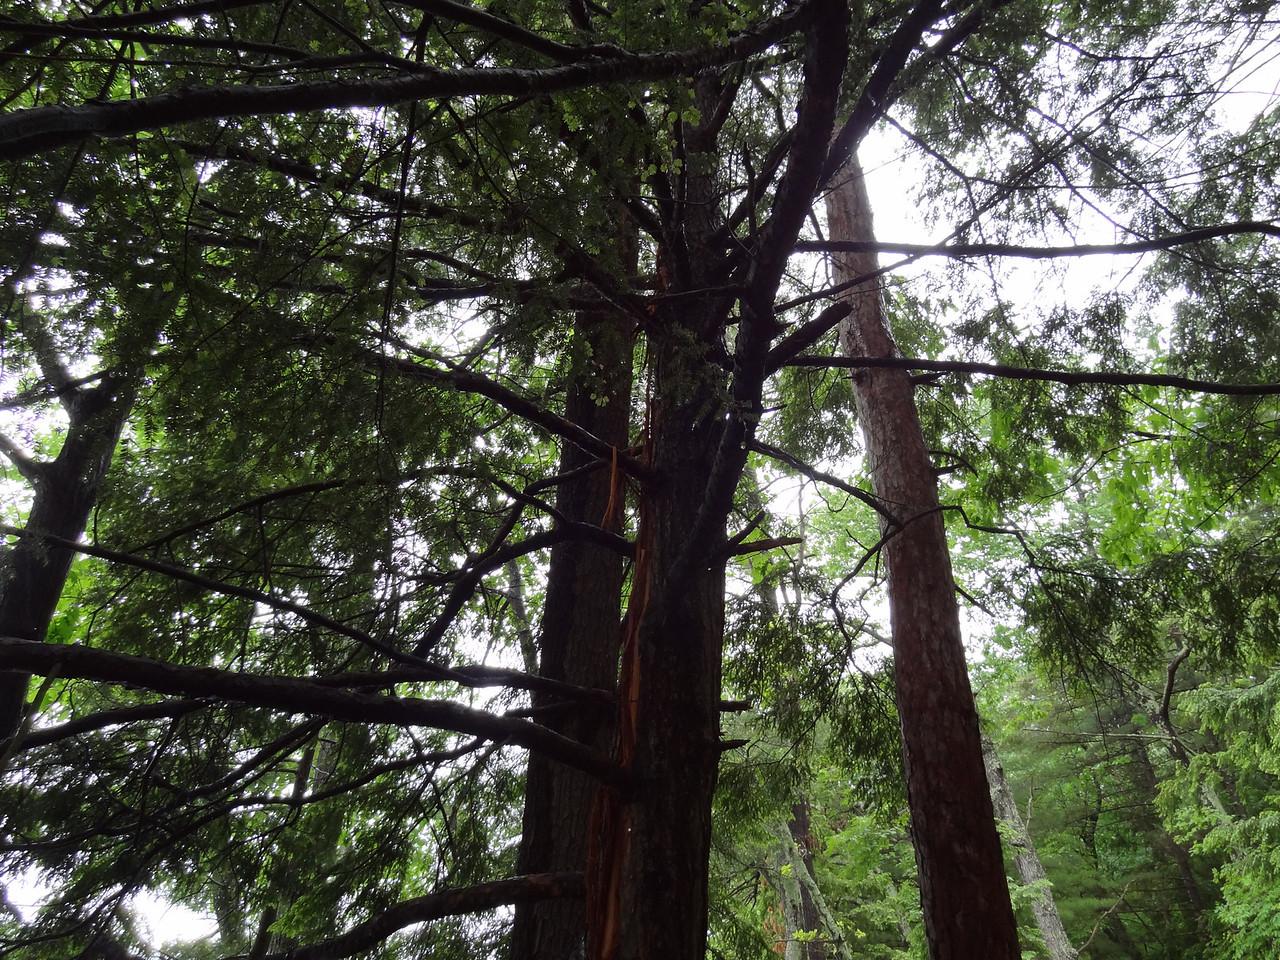 Same Tree up higher.